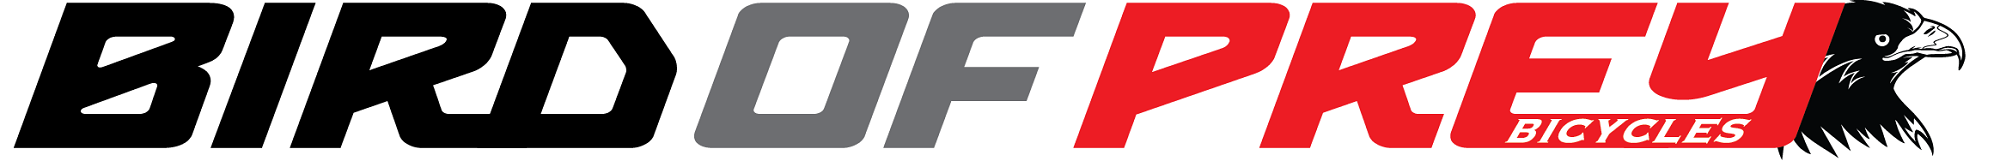 BIRD OF PREY BICYCLE Logo